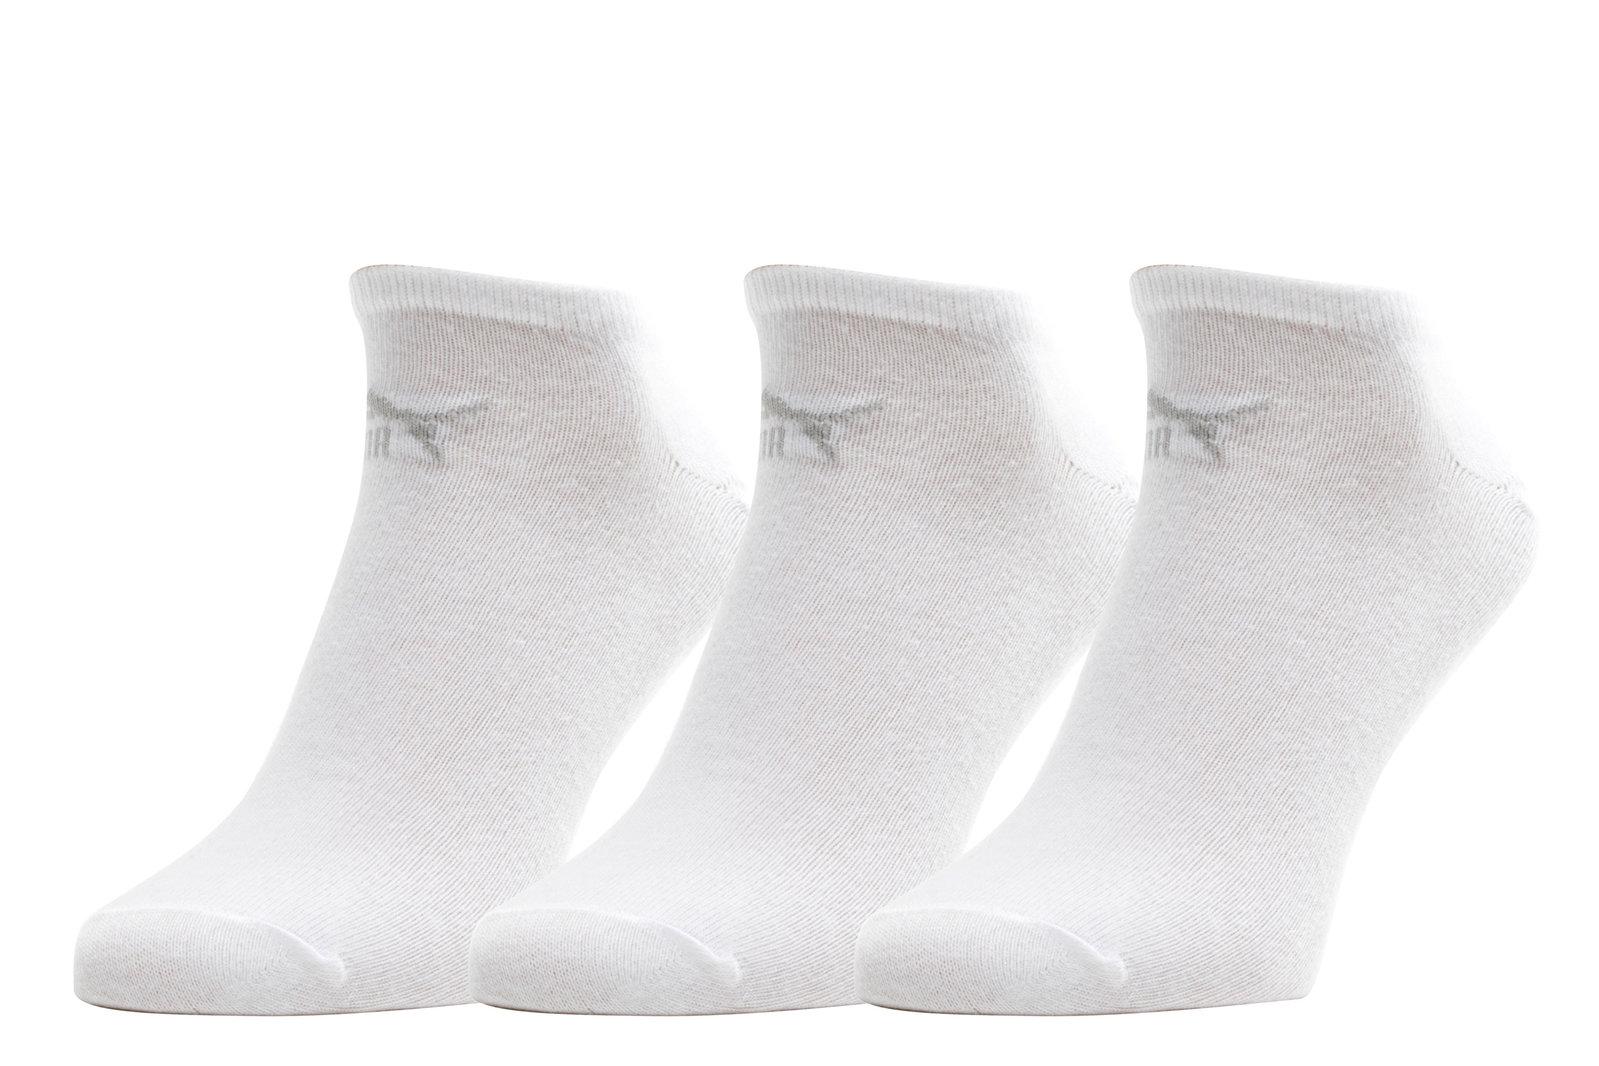 Image of Adult 3 Pack Trainer Socks